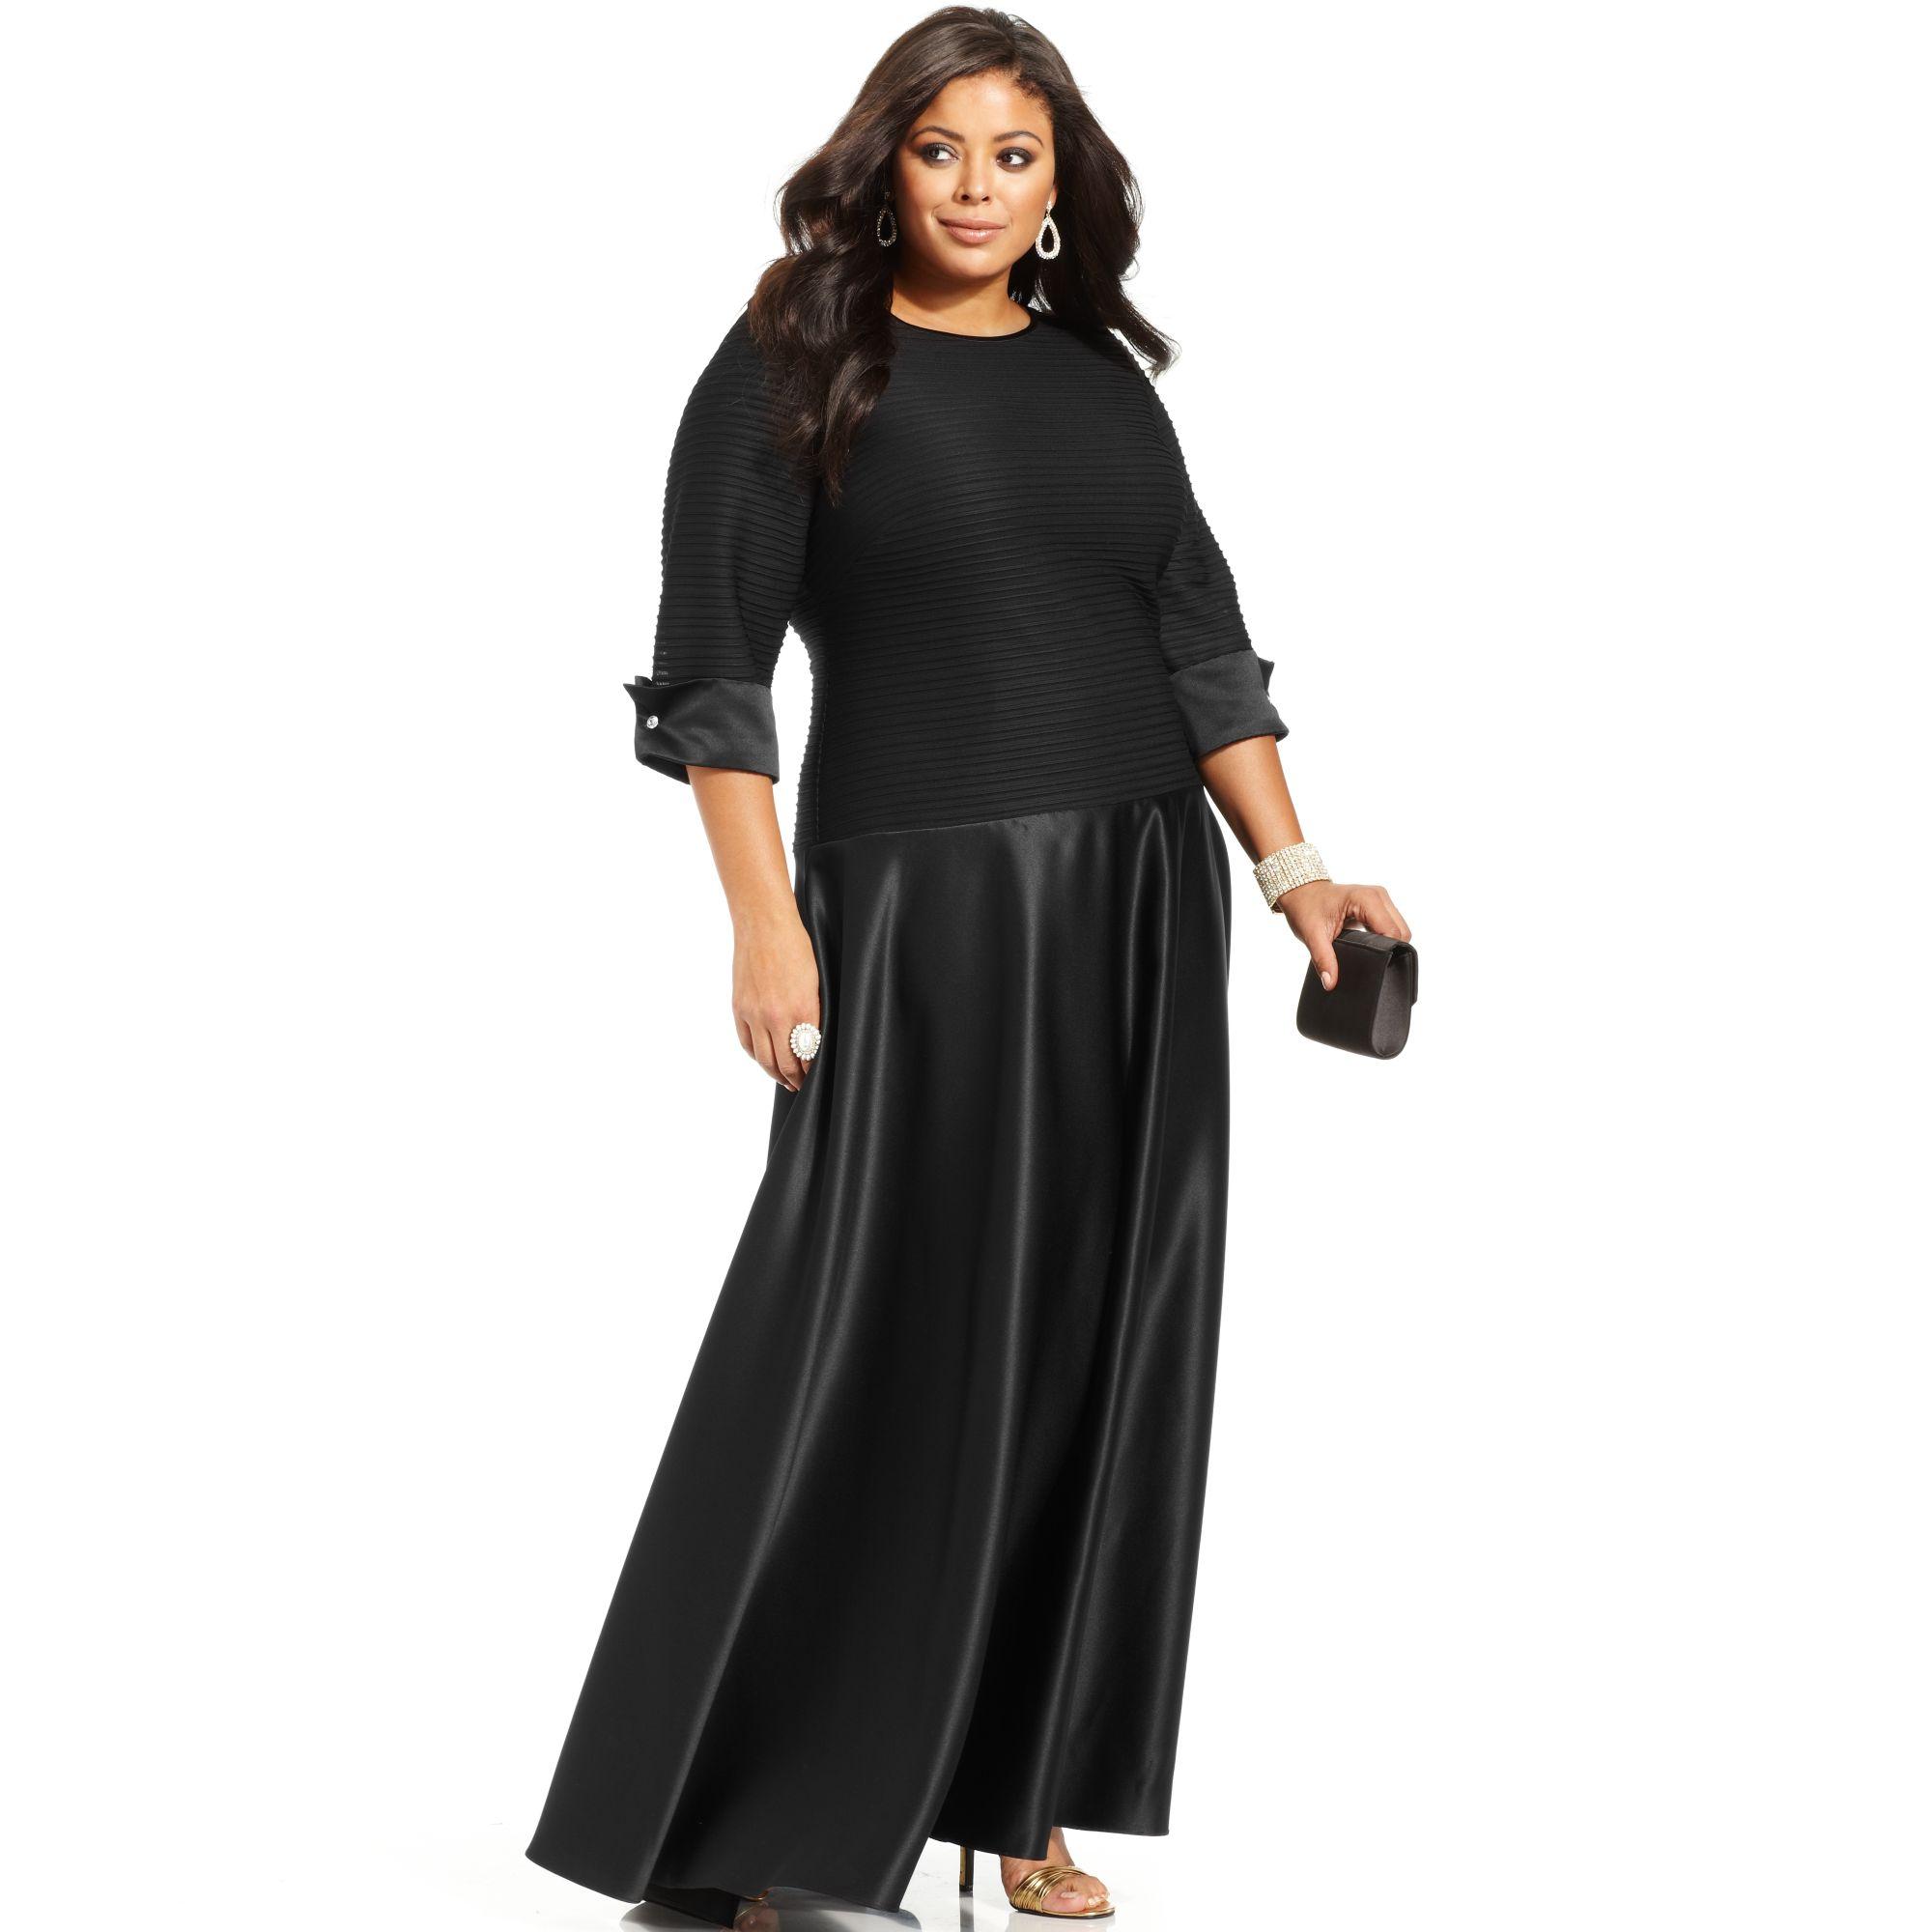 Xscape Plus Size Three Quarter Sleeve Shutter Pleat Gown in Black - Lyst